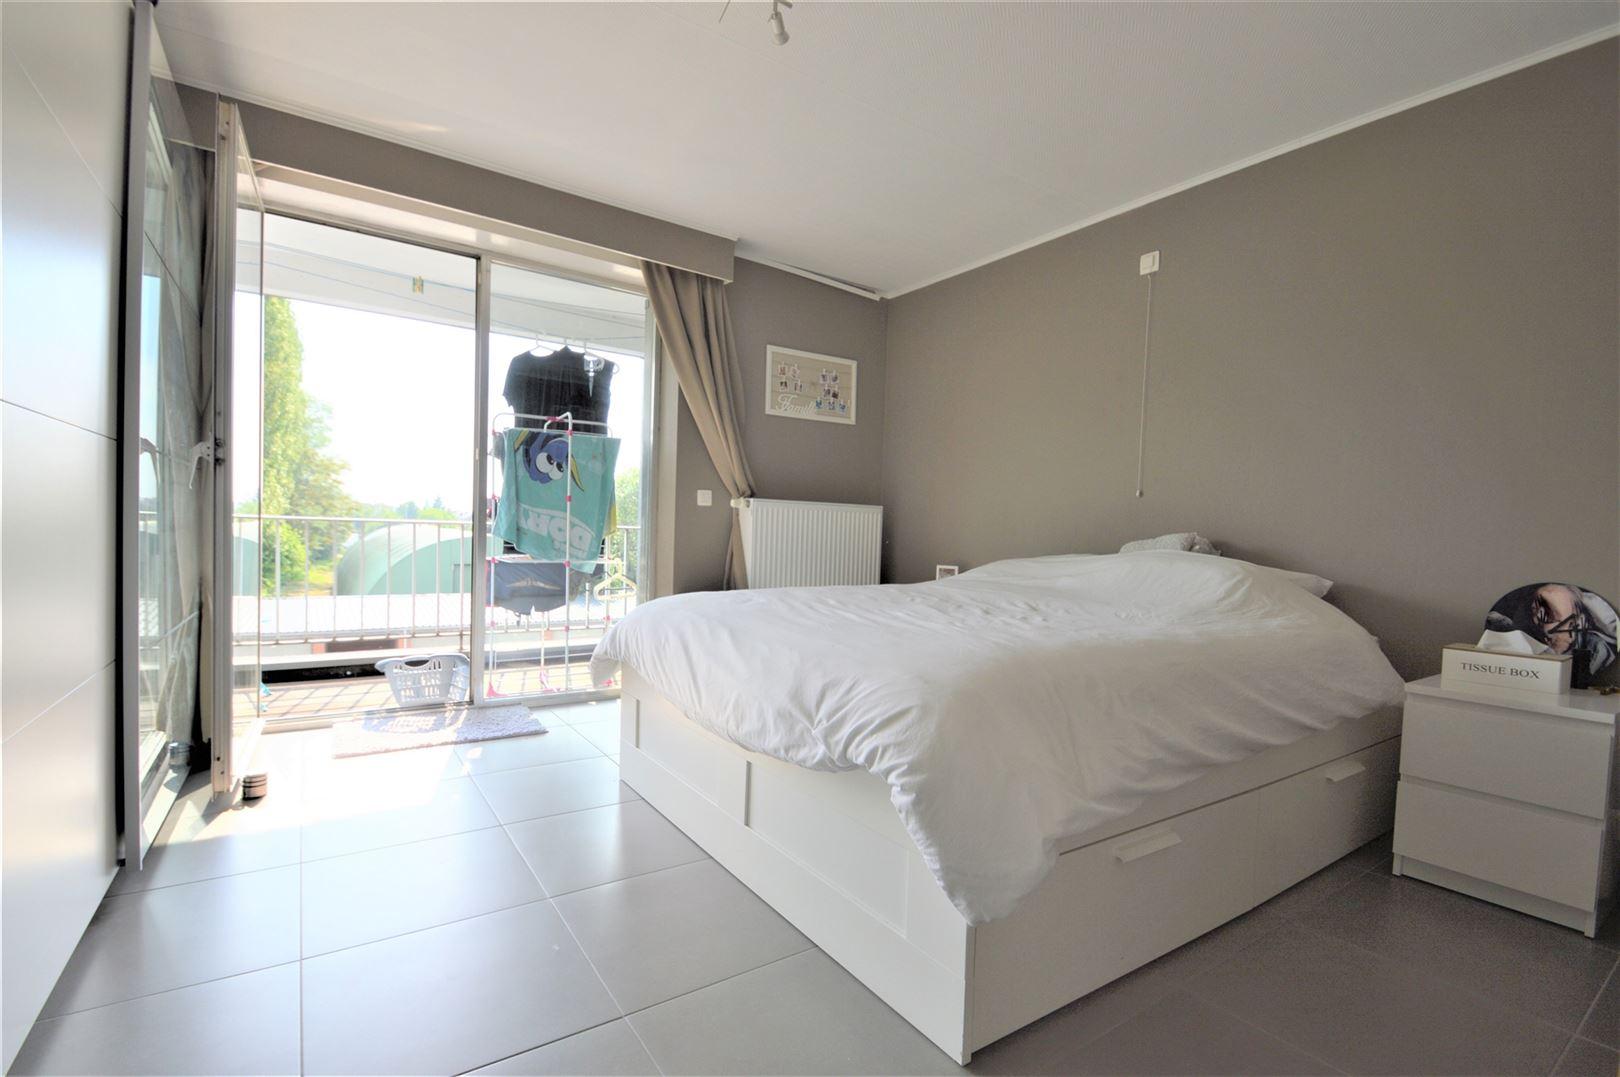 Foto 4 : Appartement te 9280 LEBBEKE (België) - Prijs € 635